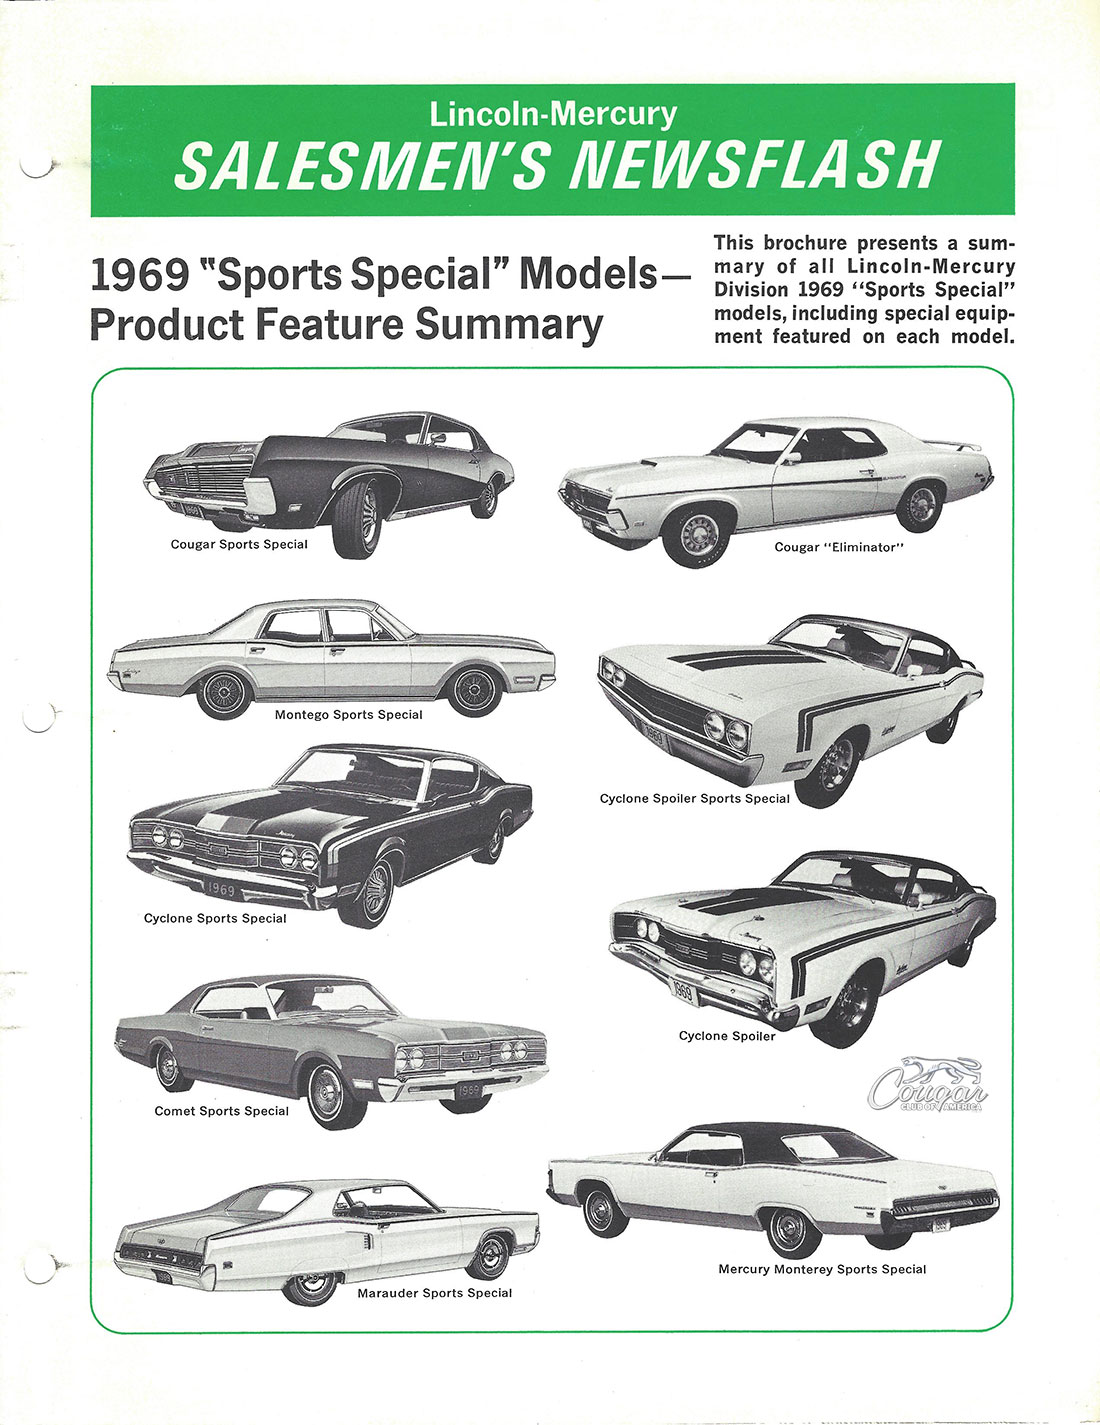 1969 Mercury Cougar Sports Special Lincoln-Mercury Salesmen's Newsflash